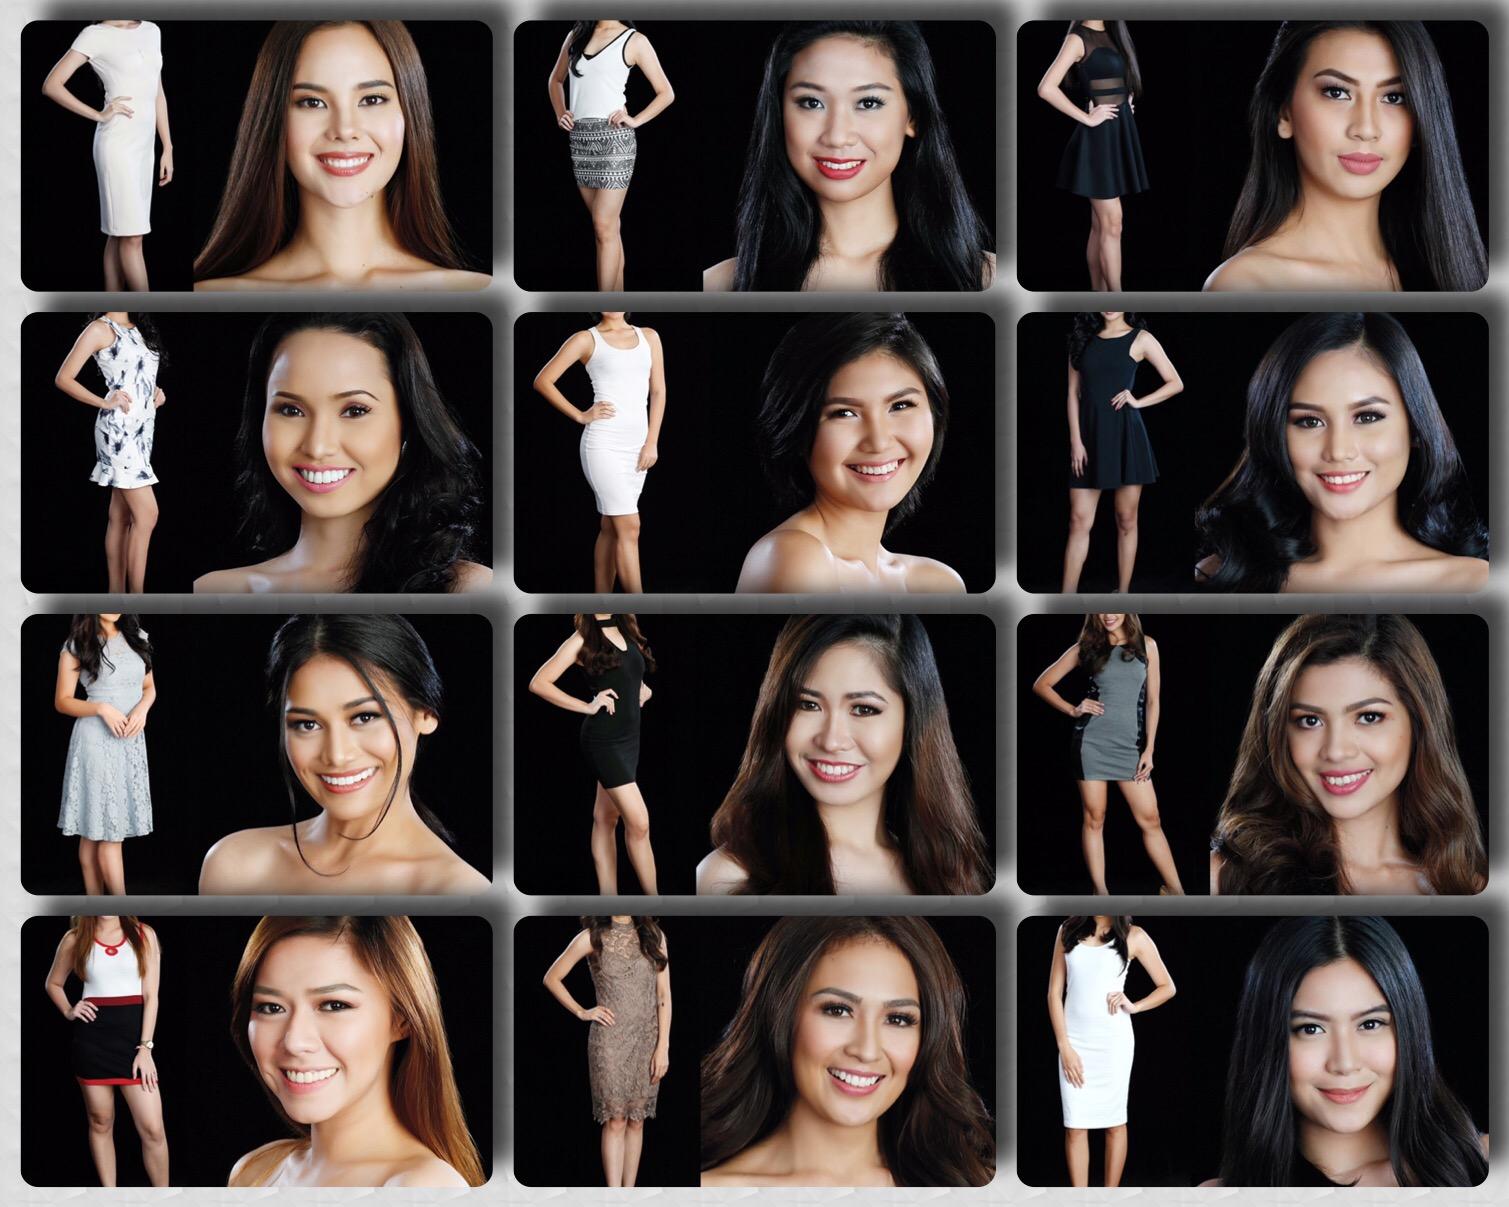 philippine election 2016 candidates